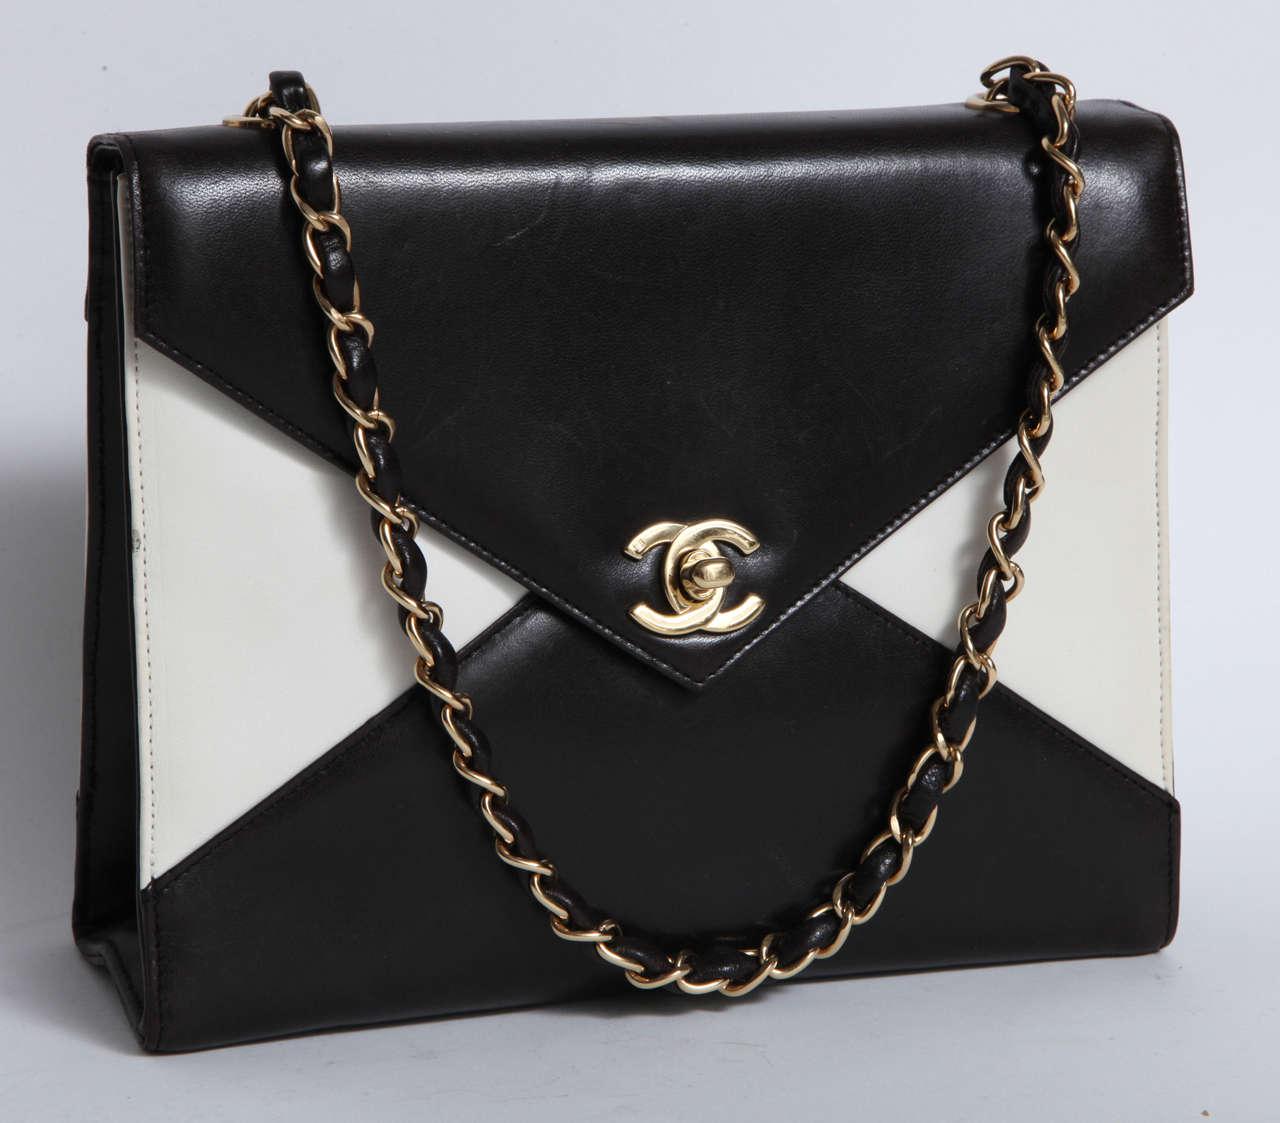 Vintage Chanel Black and White Handbag 2